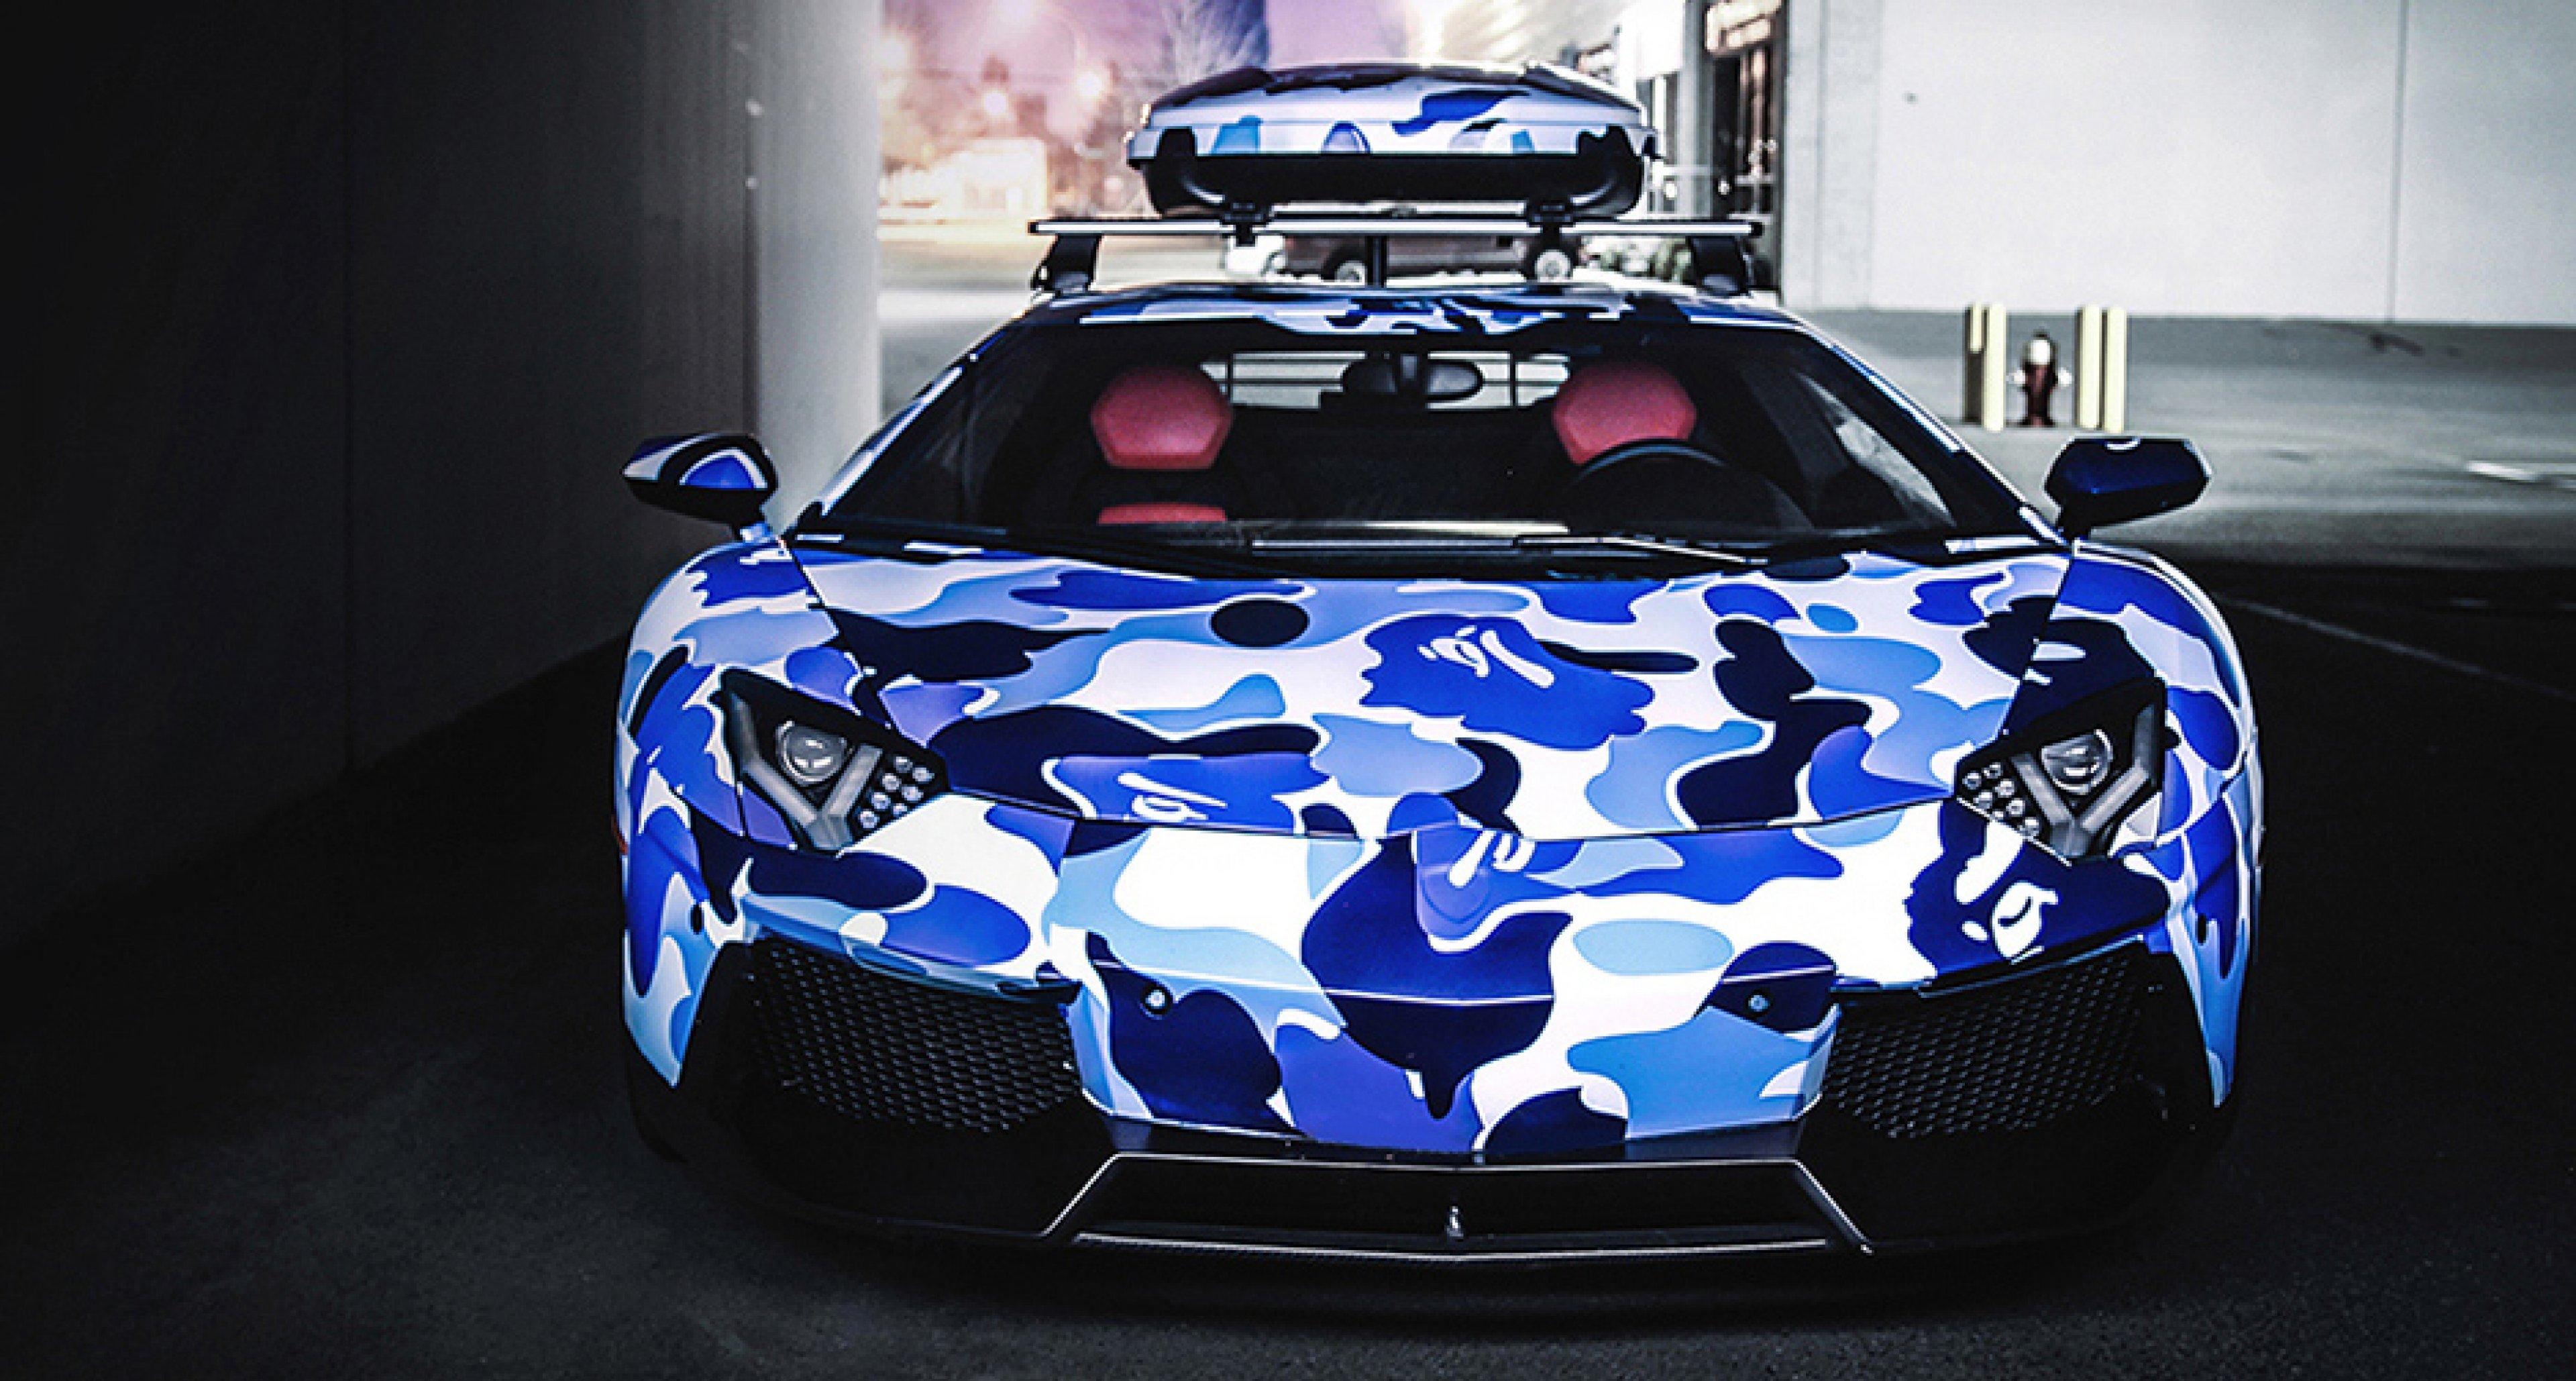 BAPE Lamborghini Aventador Arctic Camo